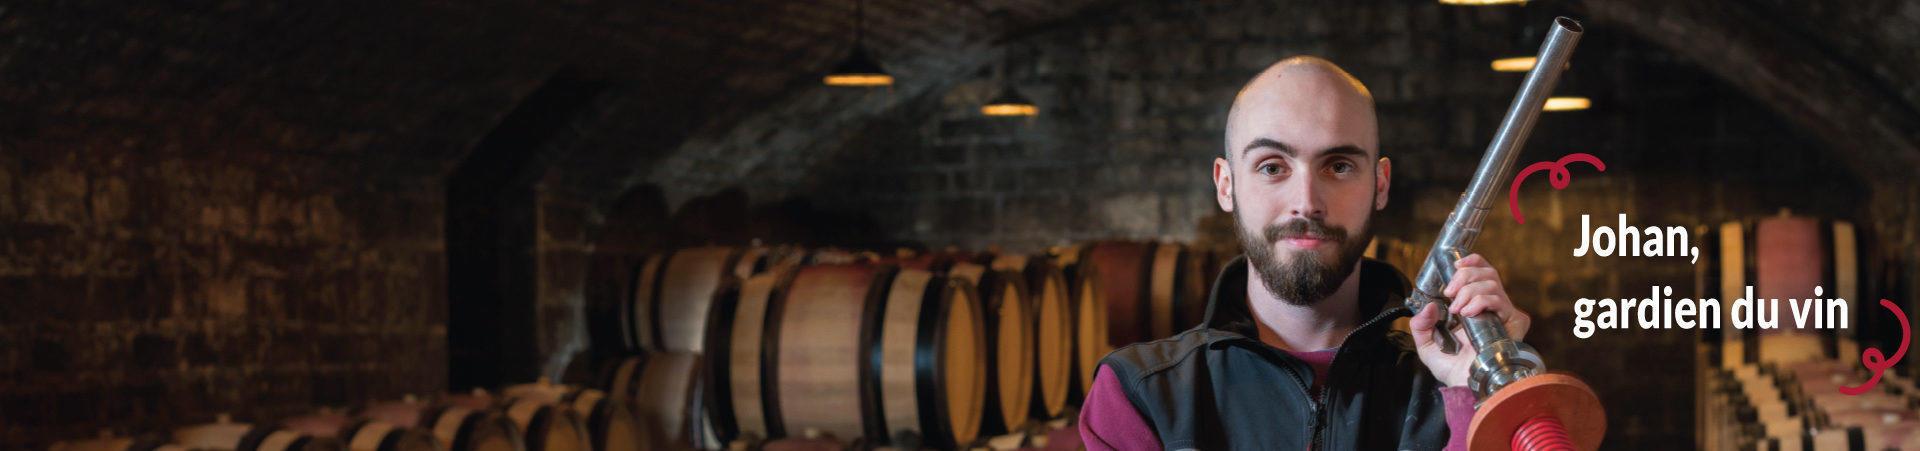 "<span class=""bordeau"">VITA Bourgogne</span>"